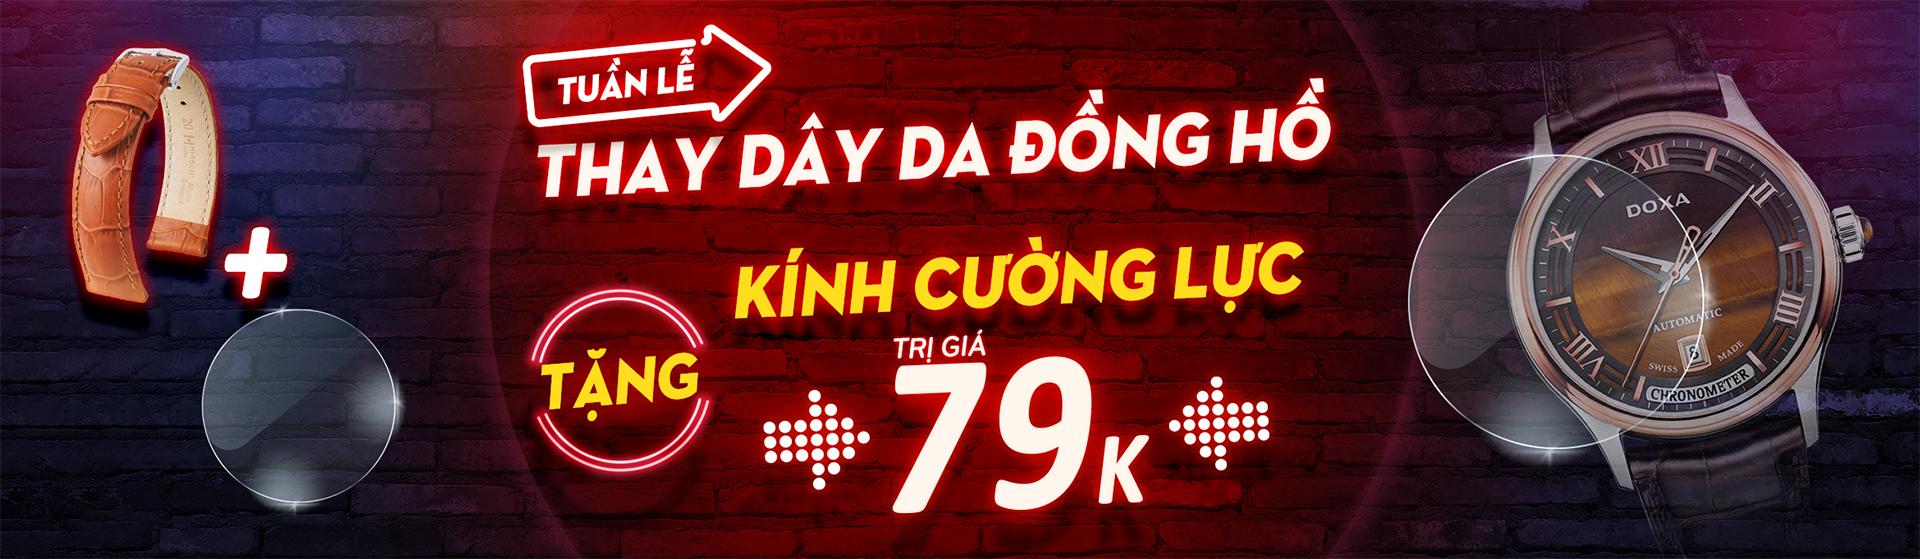 Landing Page chuong trinh giam gia 35% day da 1